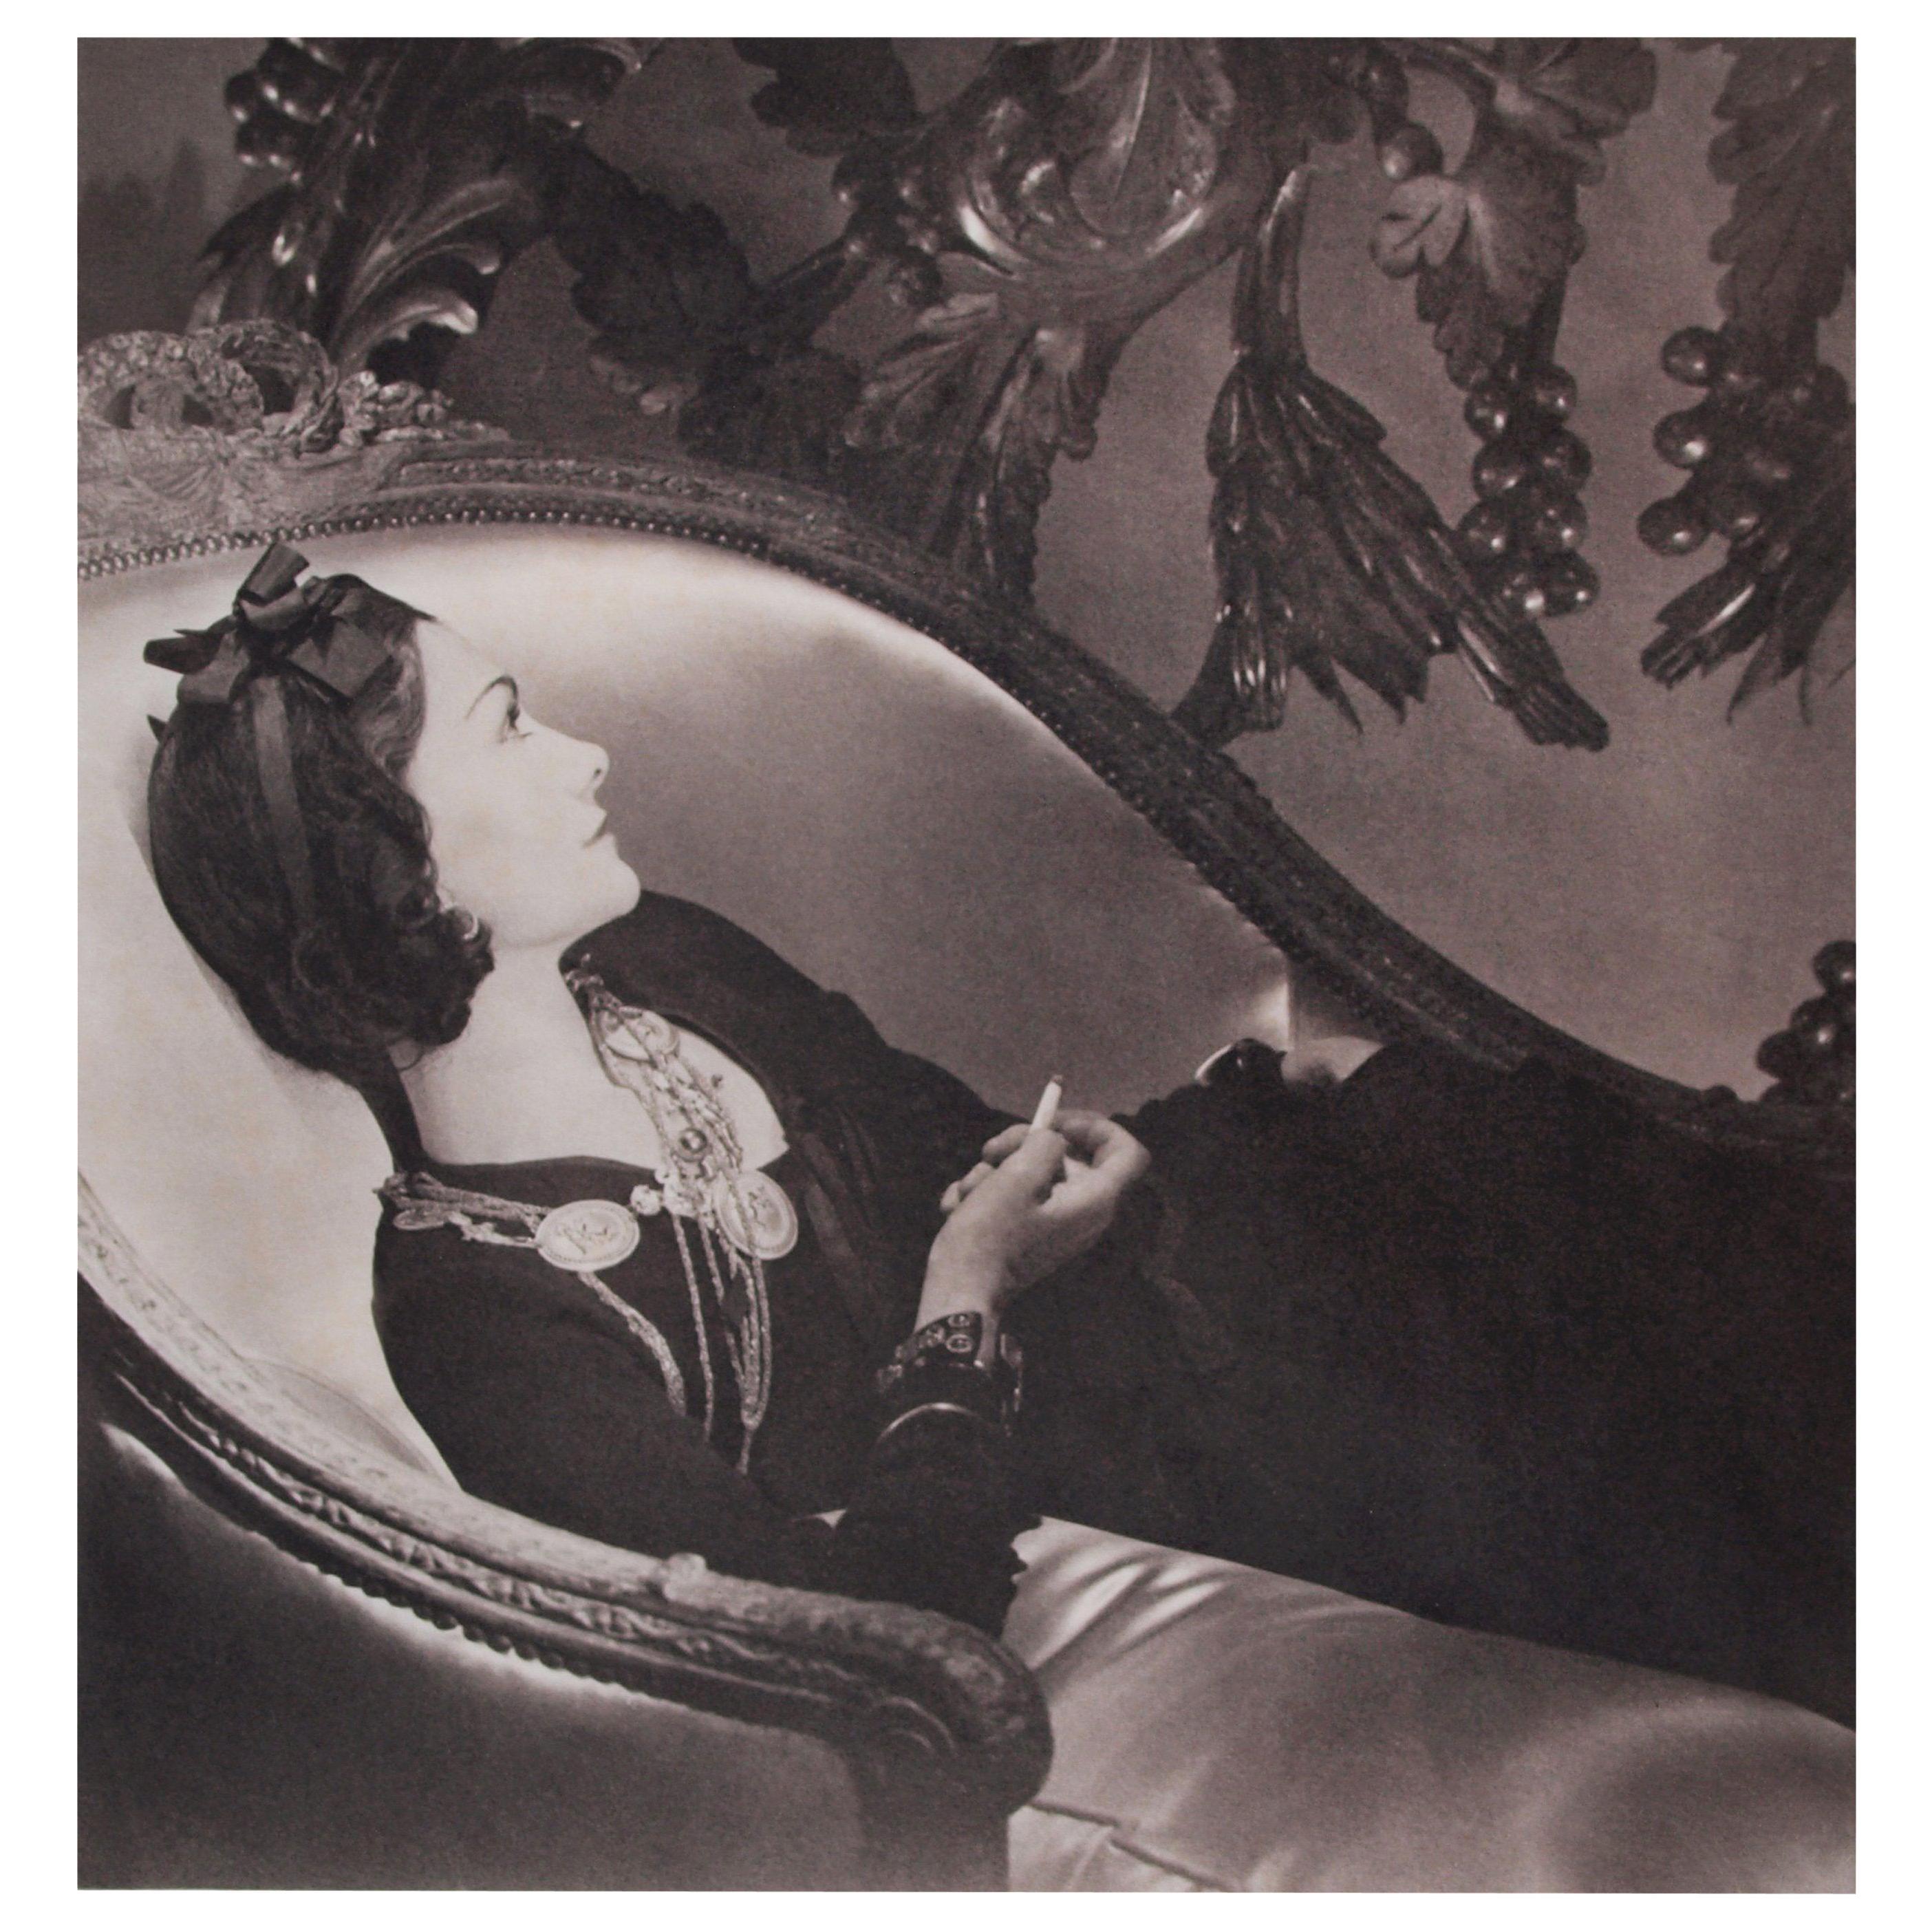 Horst P Horst Signed Photograph of Coco Chanel, Platinum Palladium Print, 1937